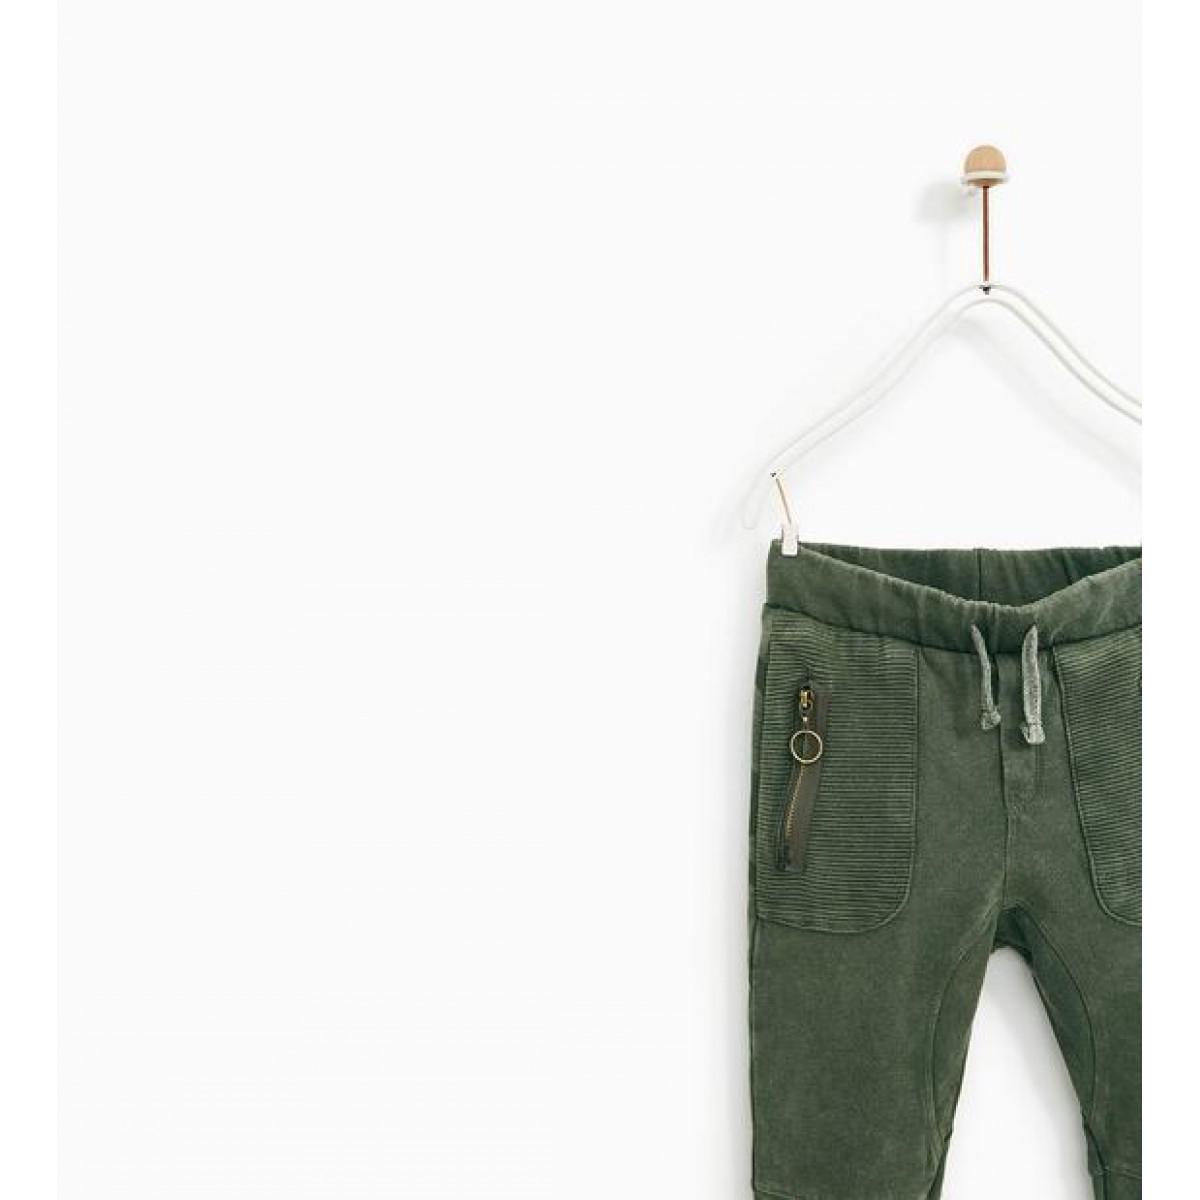 Zara Plush Jersey Skull Trousers